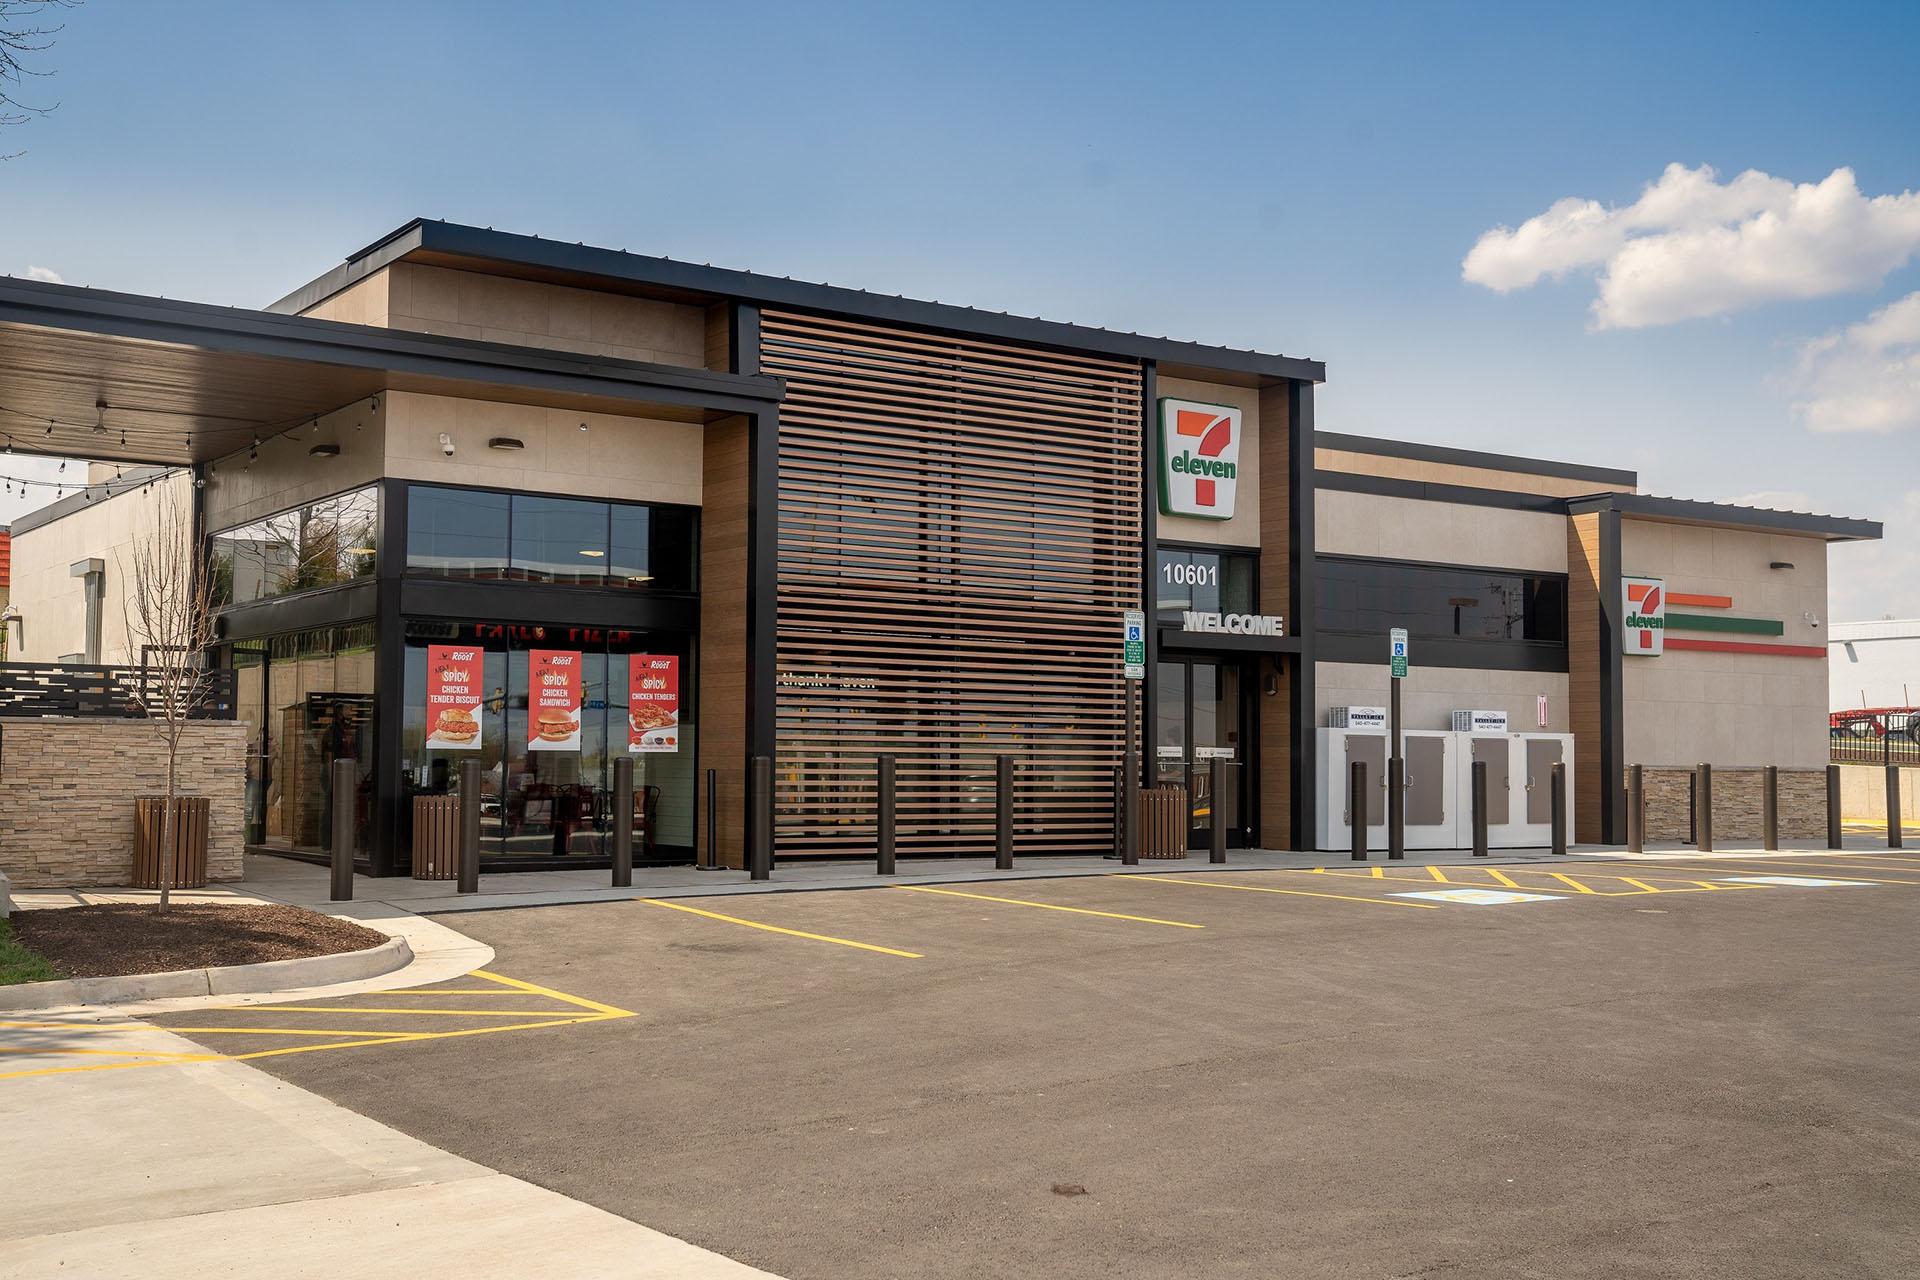 Manassas gains new 7-Eleven Evolution Store